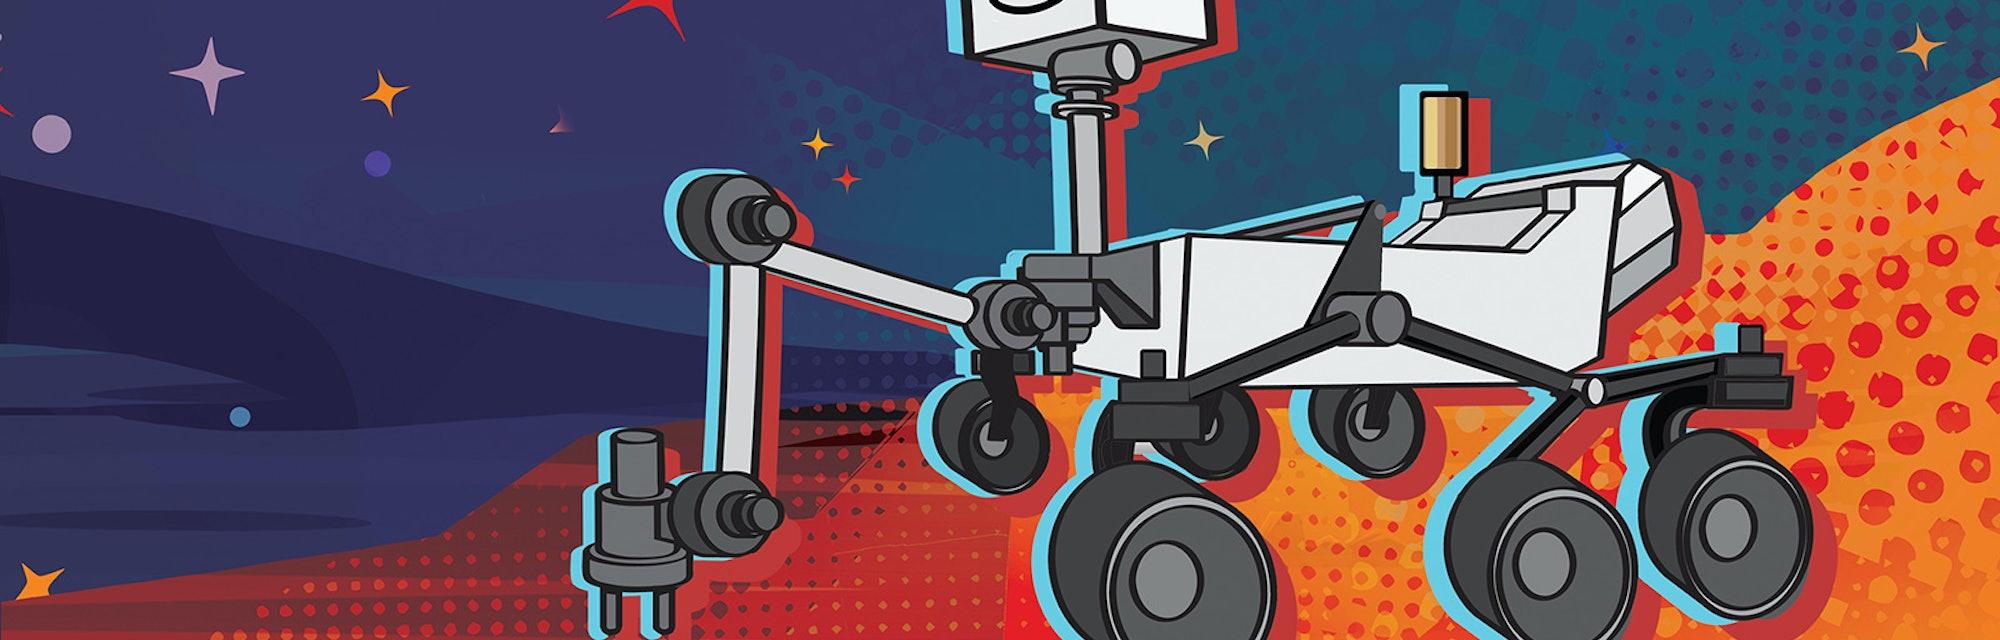 NASA Mars 2020 robot cartoon